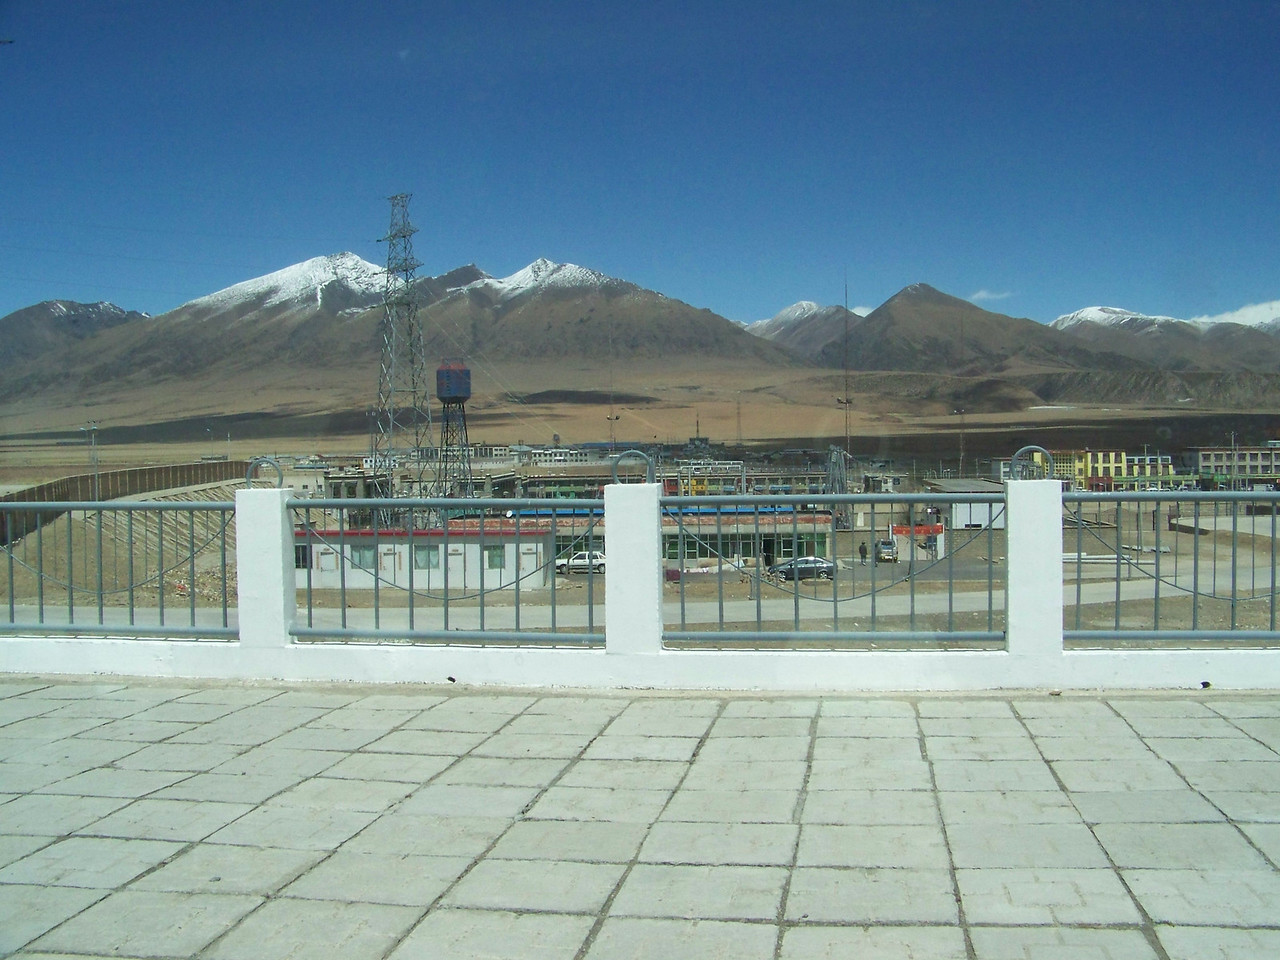 0116 - Town of Dang Xiong on Train Trip Between Beijing and Lhasa.JPG